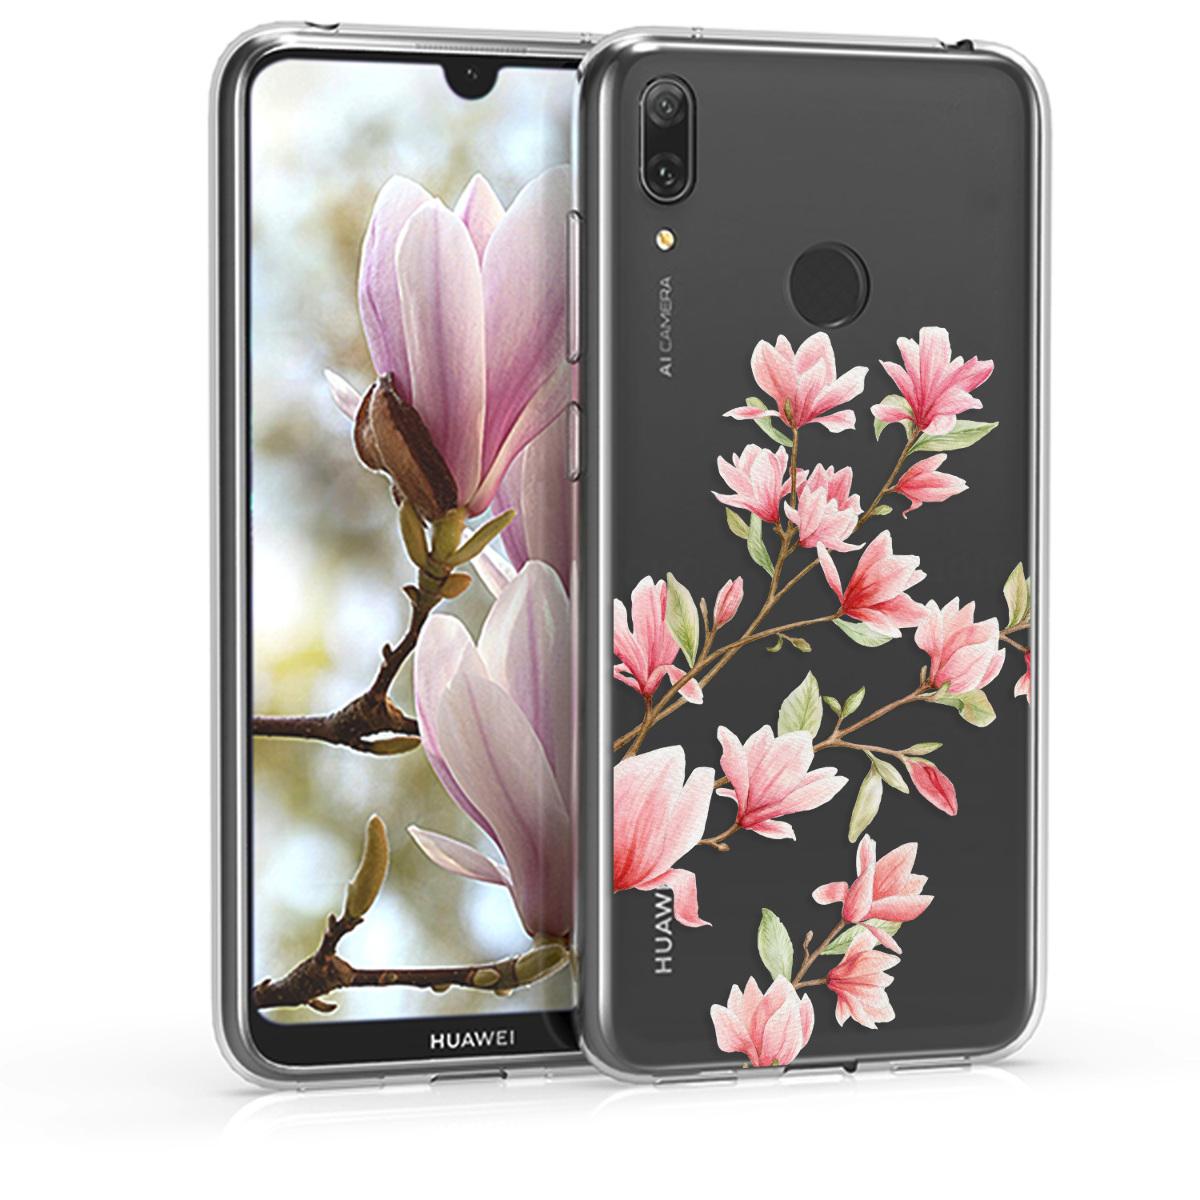 KW Θήκη Σιλικόνης Huawei Y7 (2019) / Y7 Prime (2019) - Light Pink / White / Transparent (47659.02)